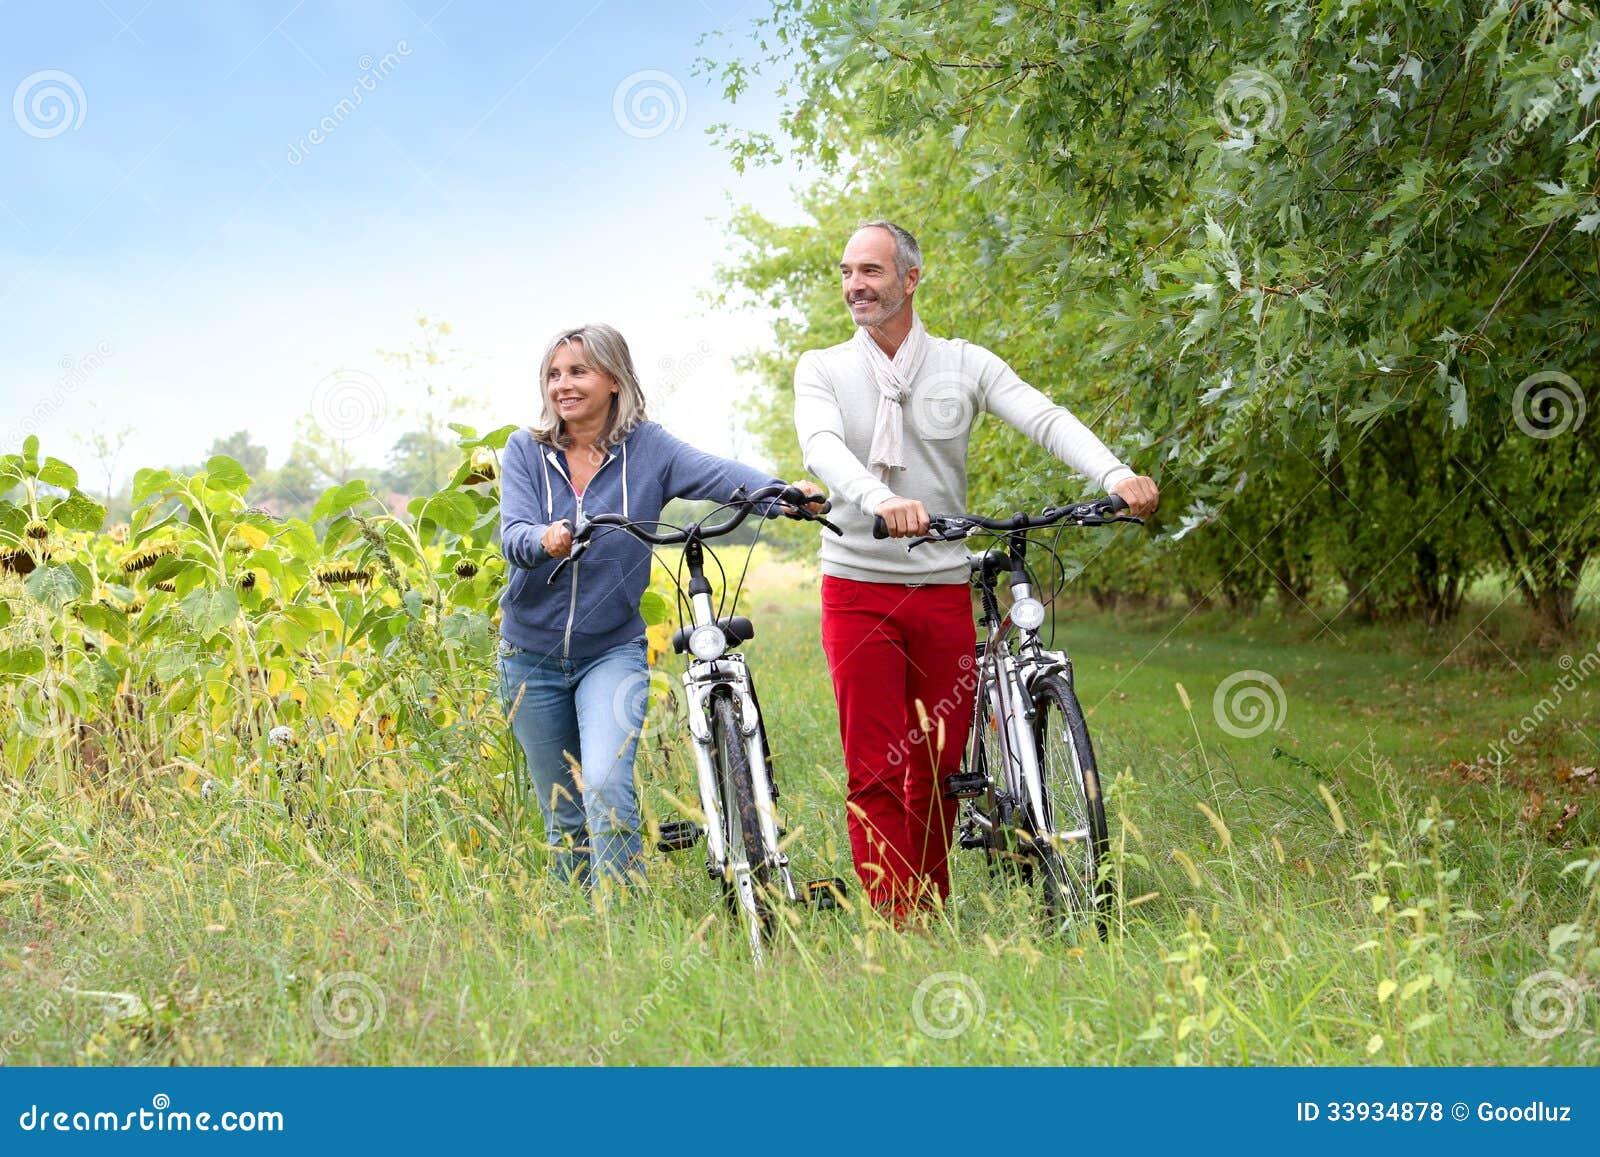 senior couple walking together on sunny day royalty free